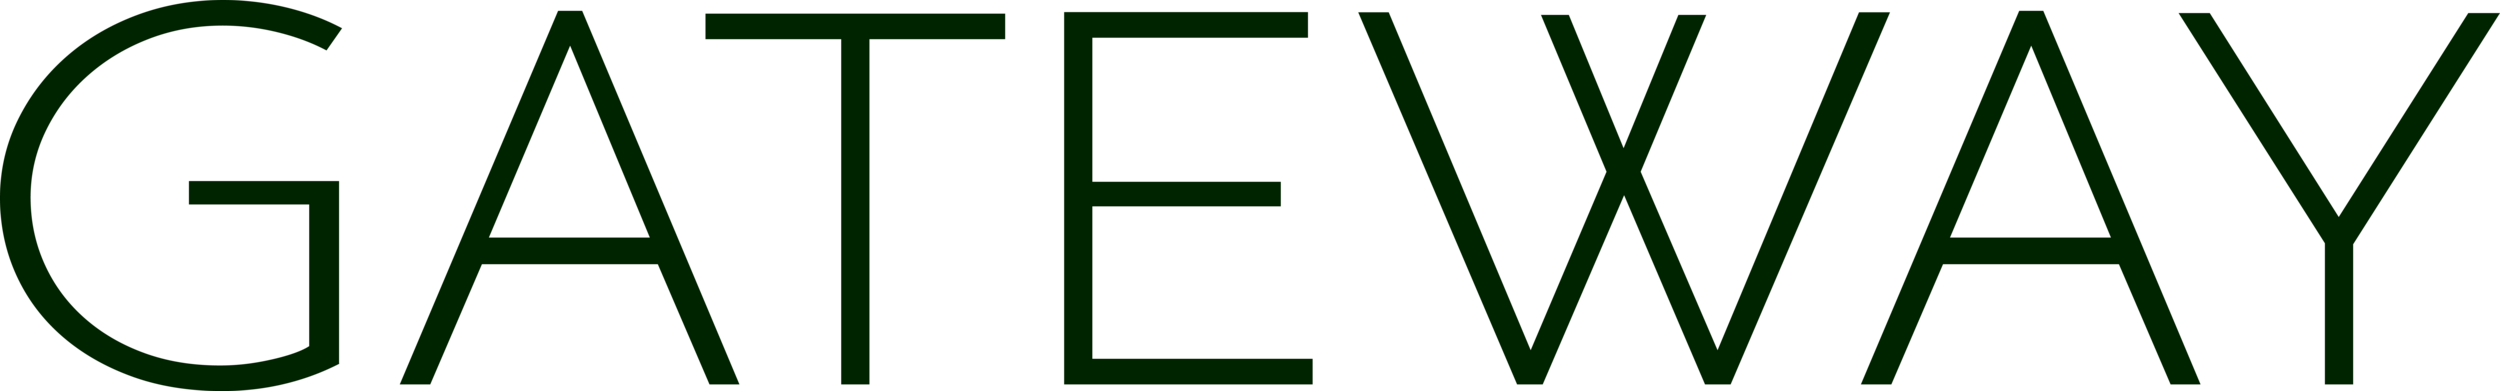 logo-green_trans.png